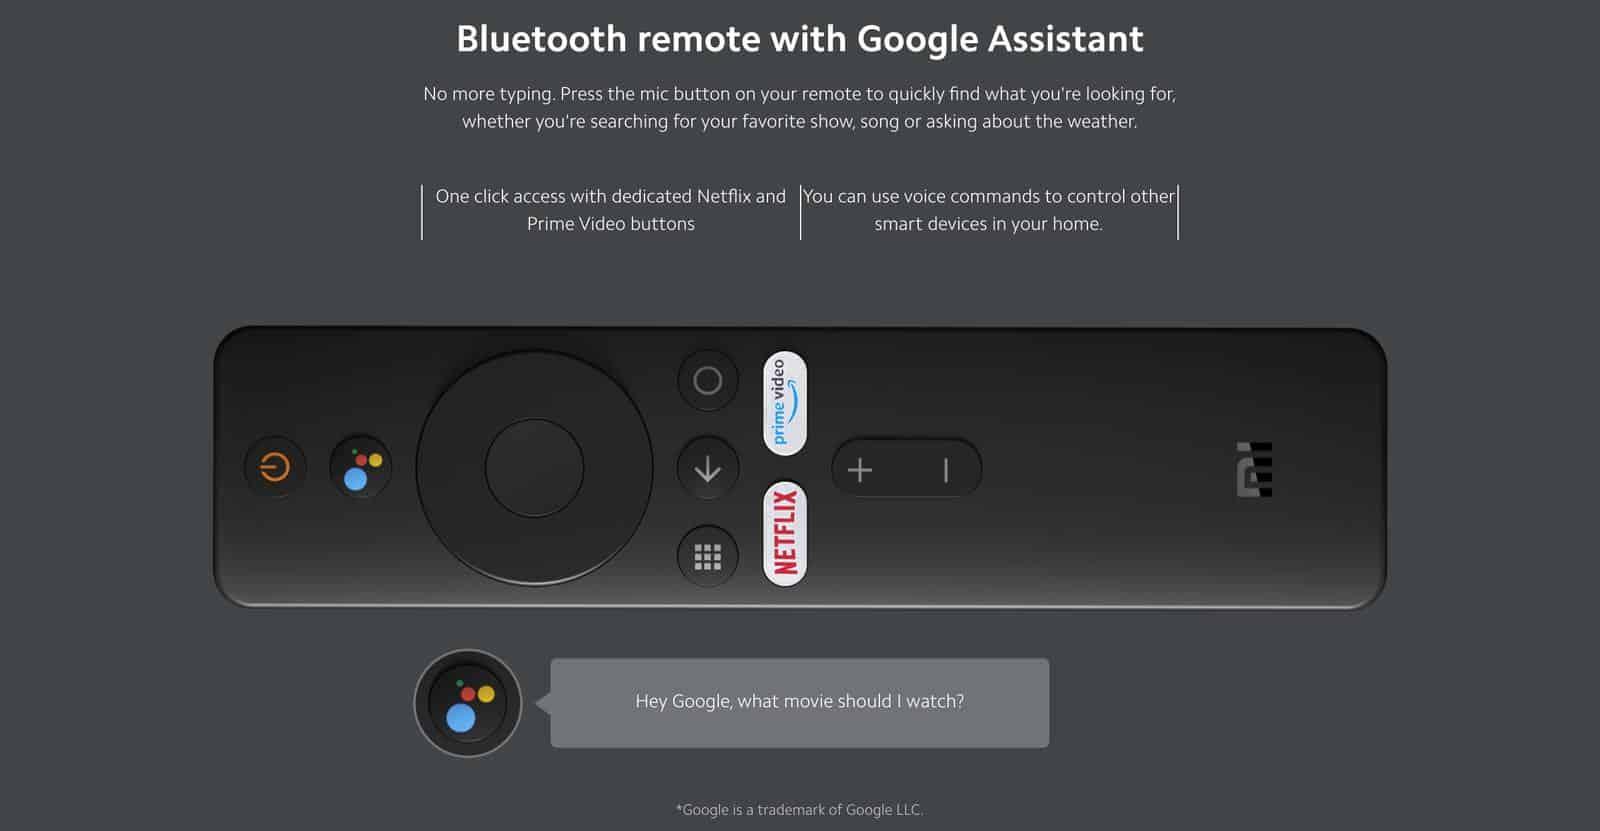 全新小米電視棒 睇Netflix YouTube + 內置 Google Assistant - 香港 unwire.hk